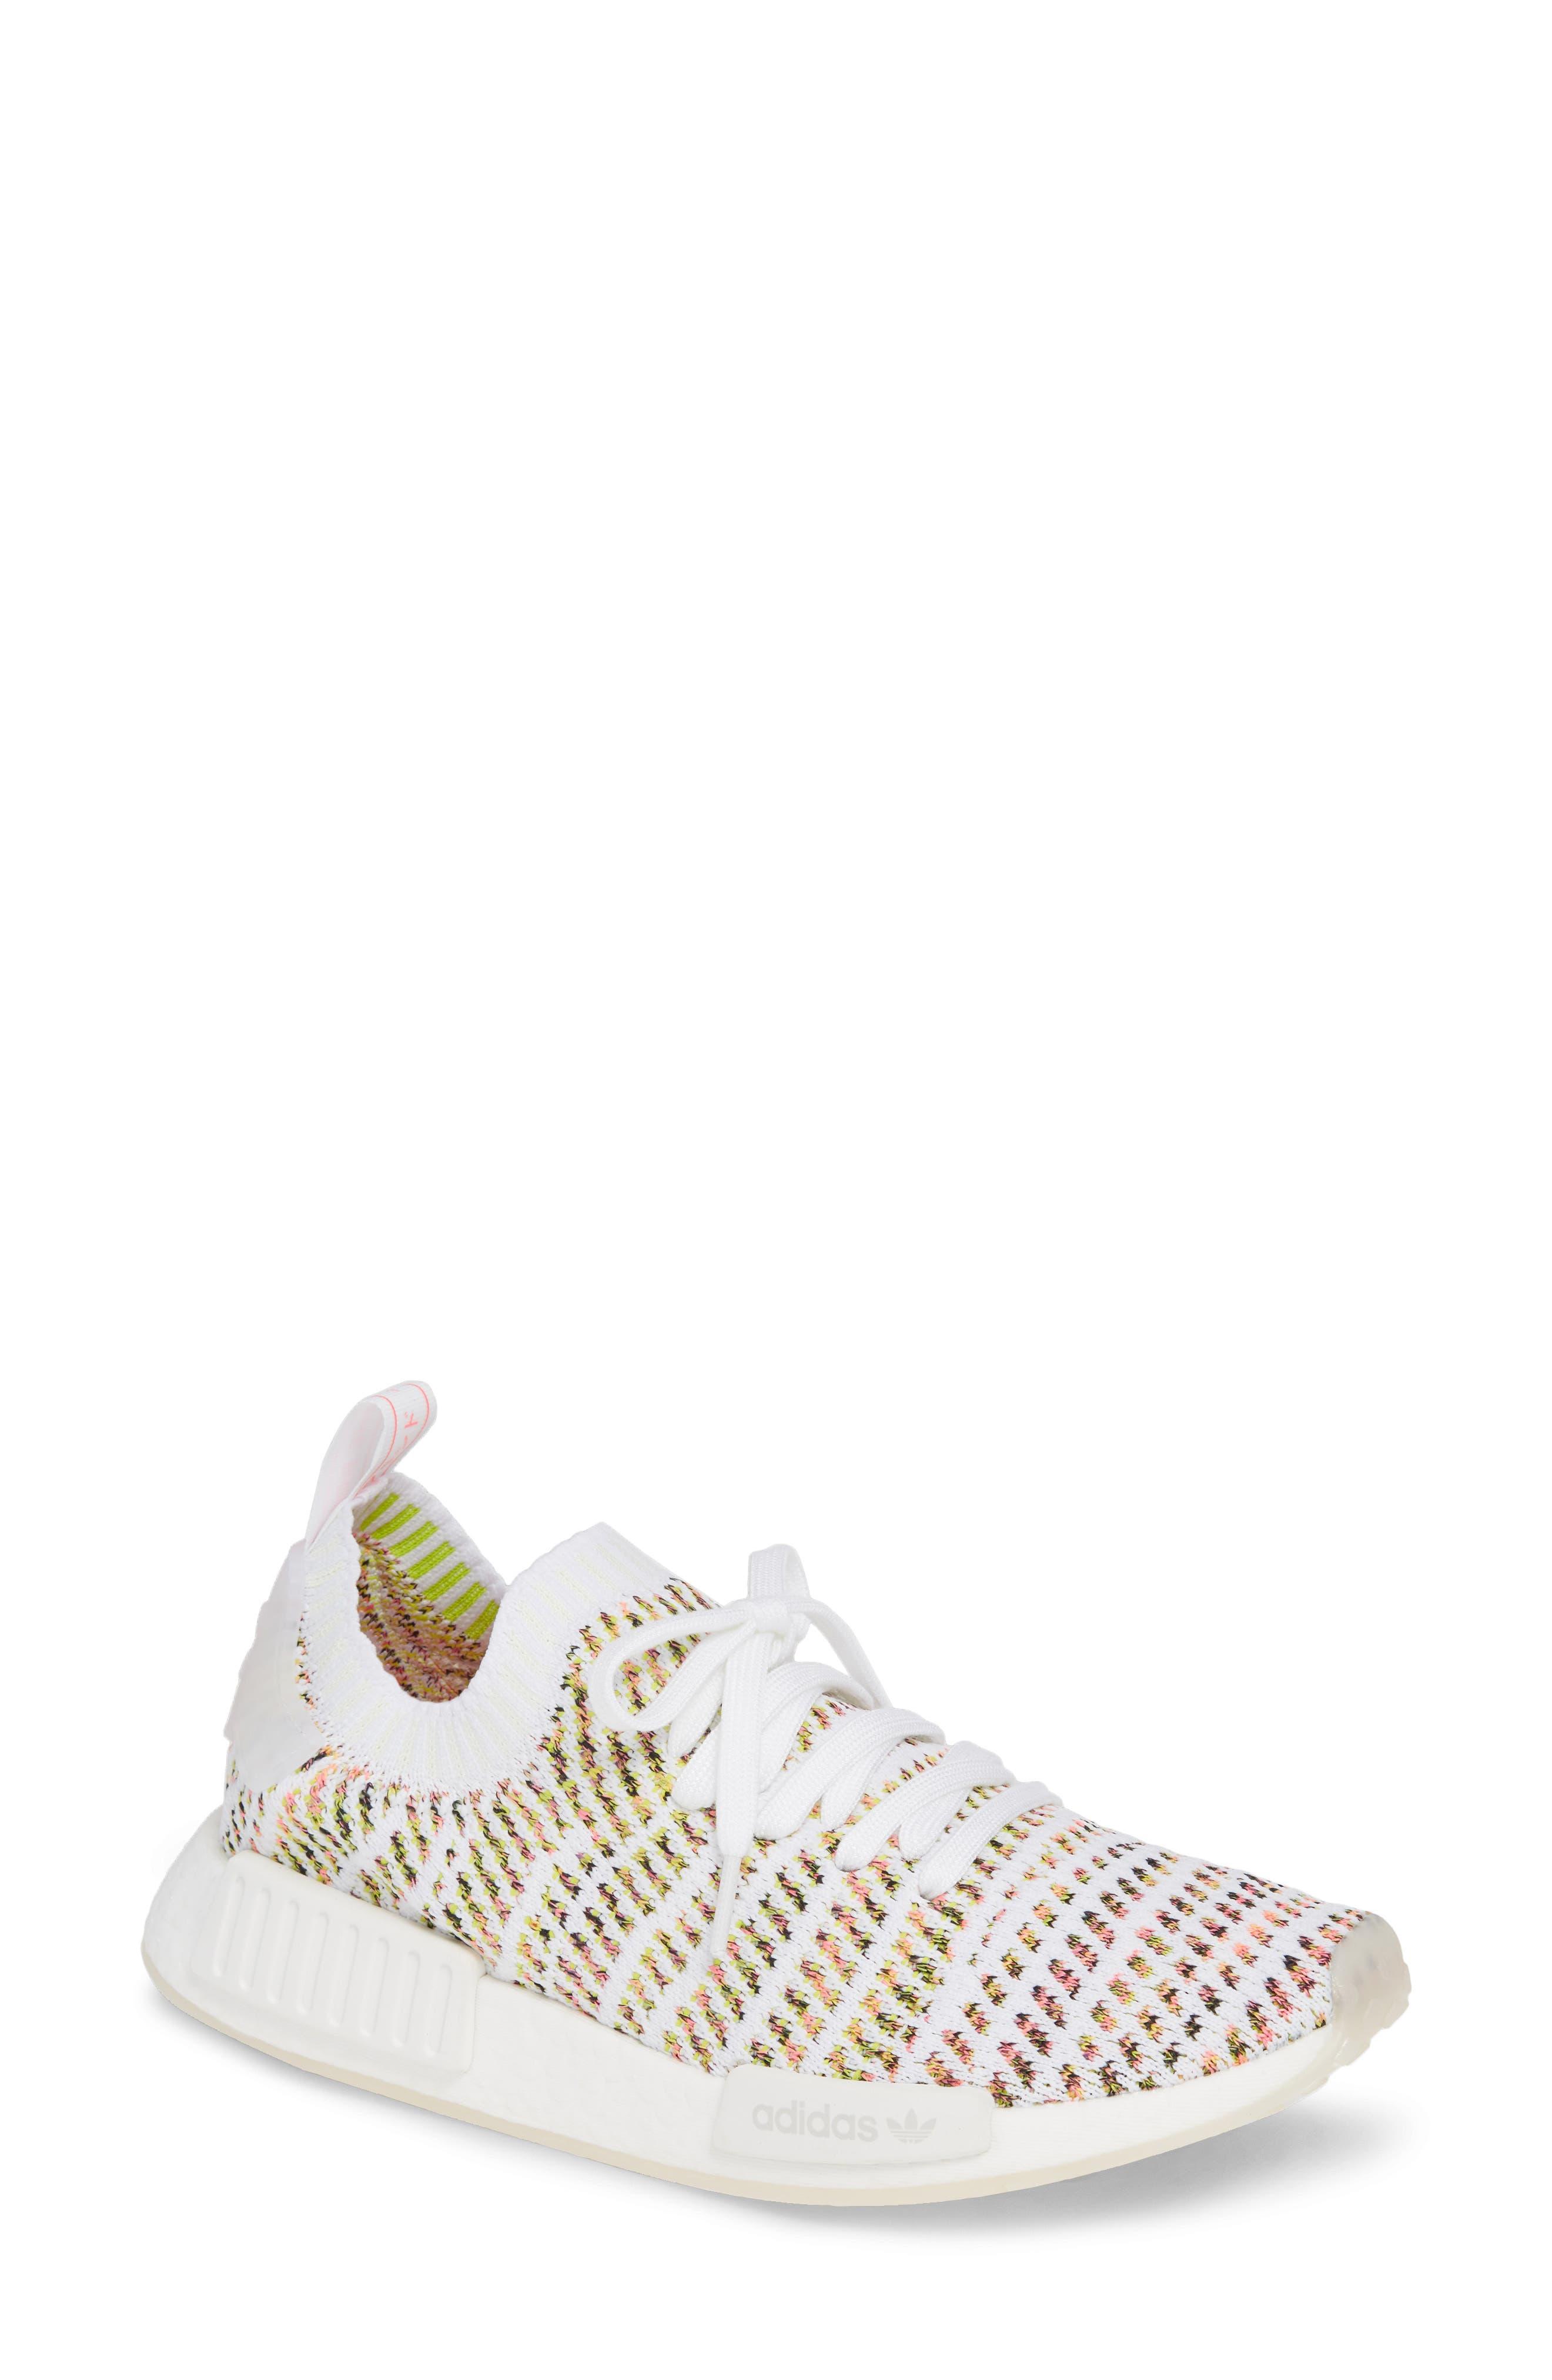 NMD R1 STLT Primeknit Sneaker,                             Main thumbnail 1, color,                             WHITE/ YELLOW/ SOLAR PINK